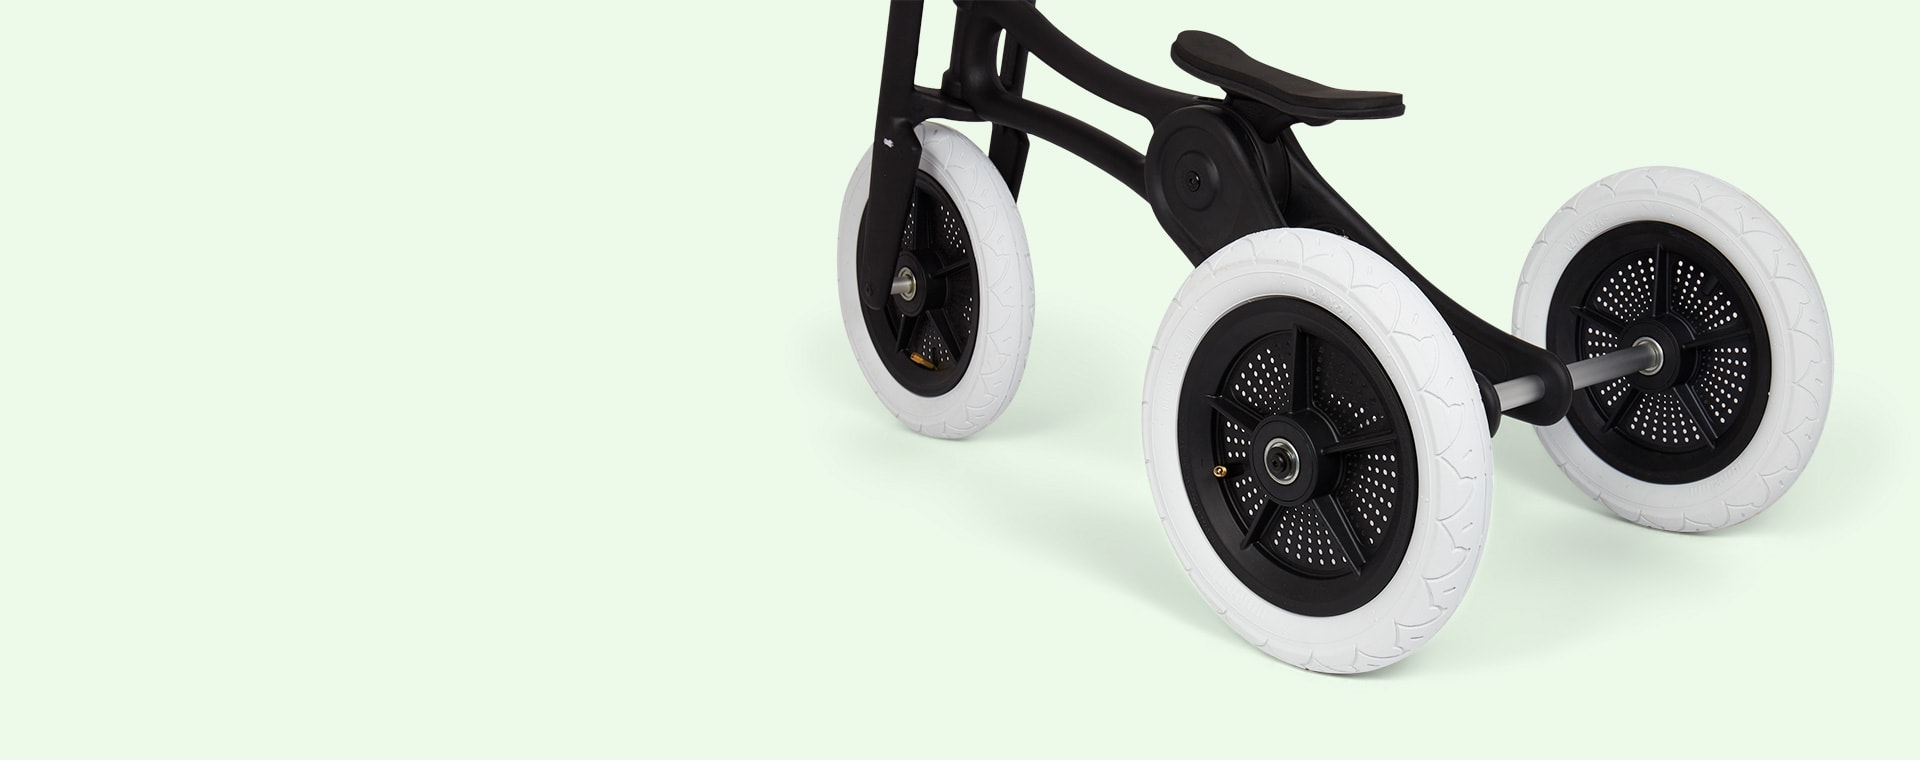 Black Wishbone Design Studio Recycled Edition 3-in-1 Bike